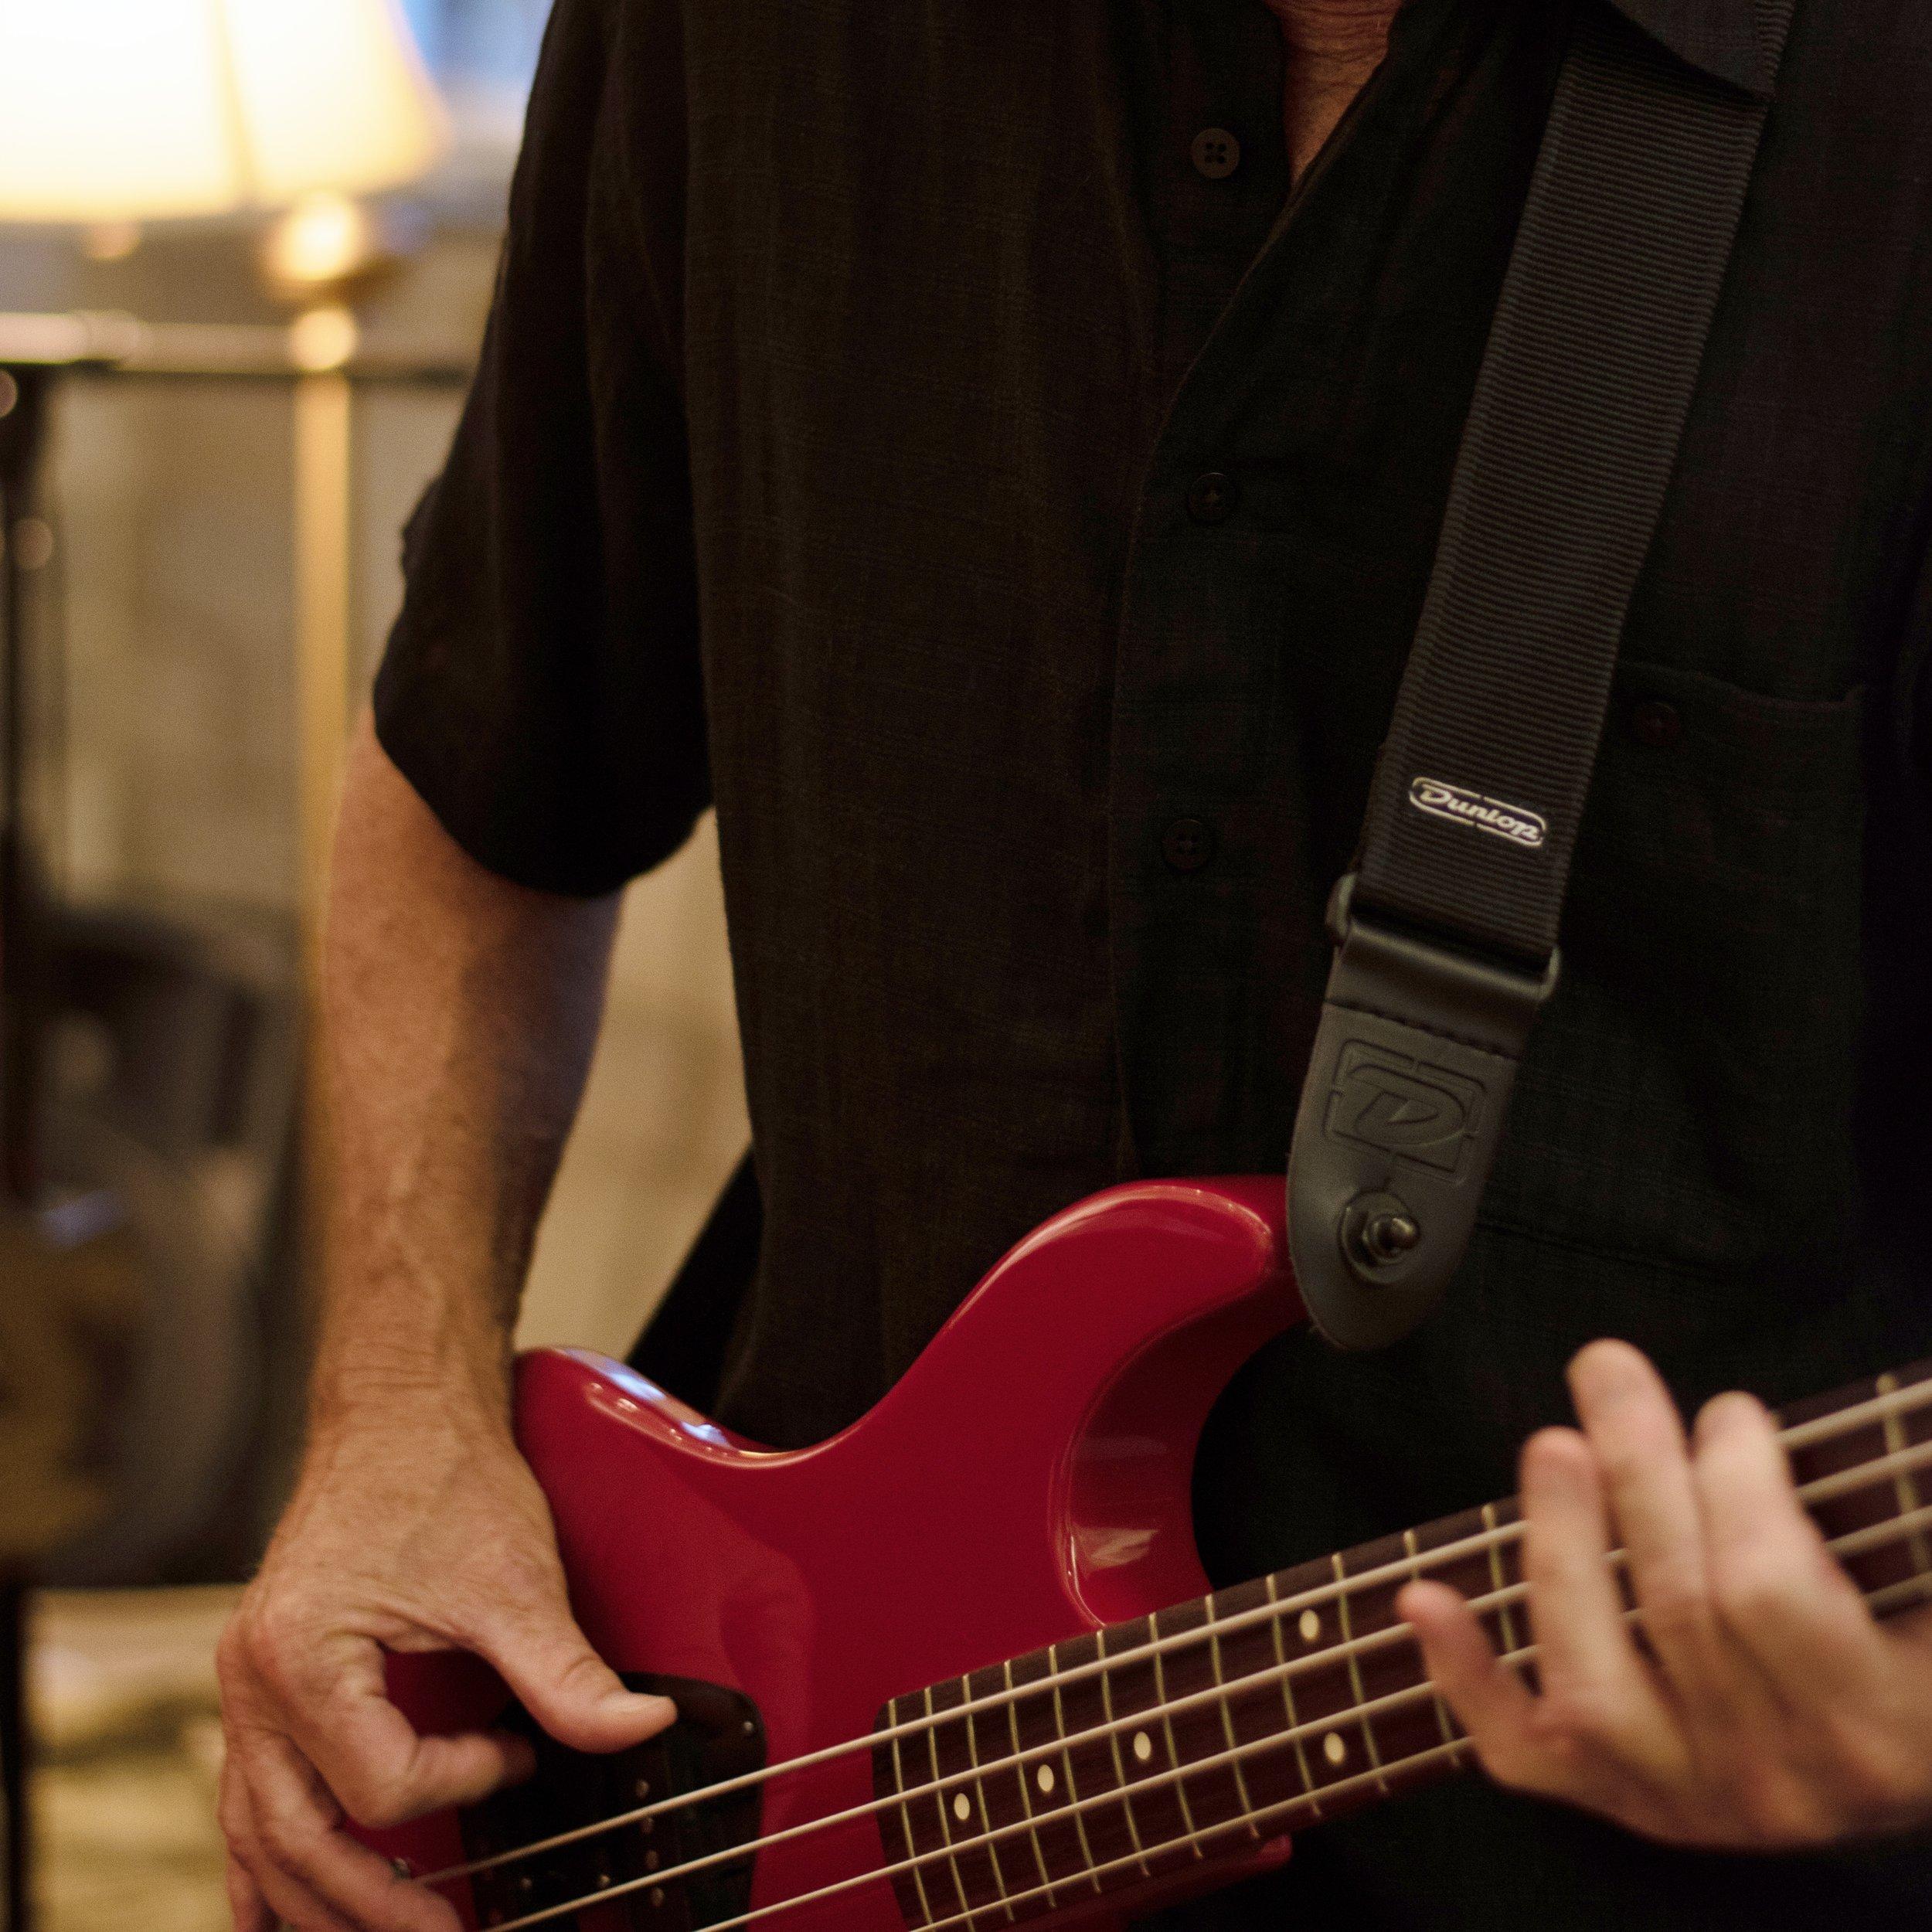 Dave bass indoor 2.jpg